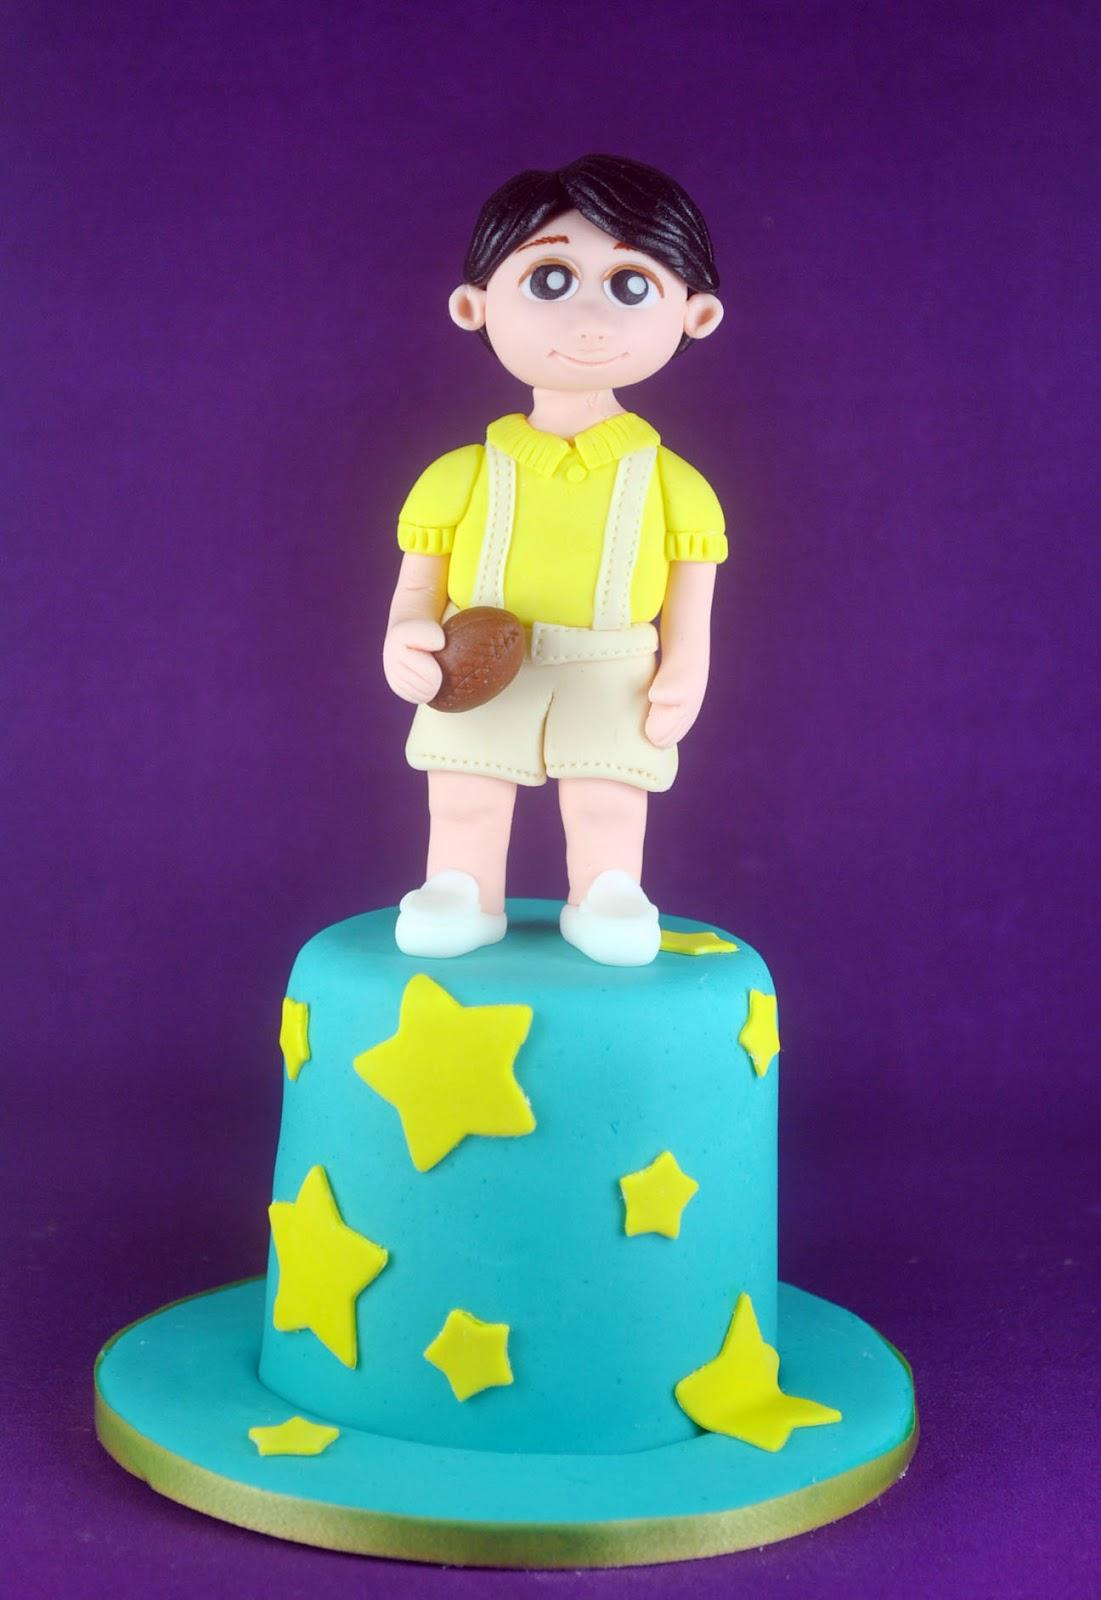 Фигурки из мастики на торт для мальчика